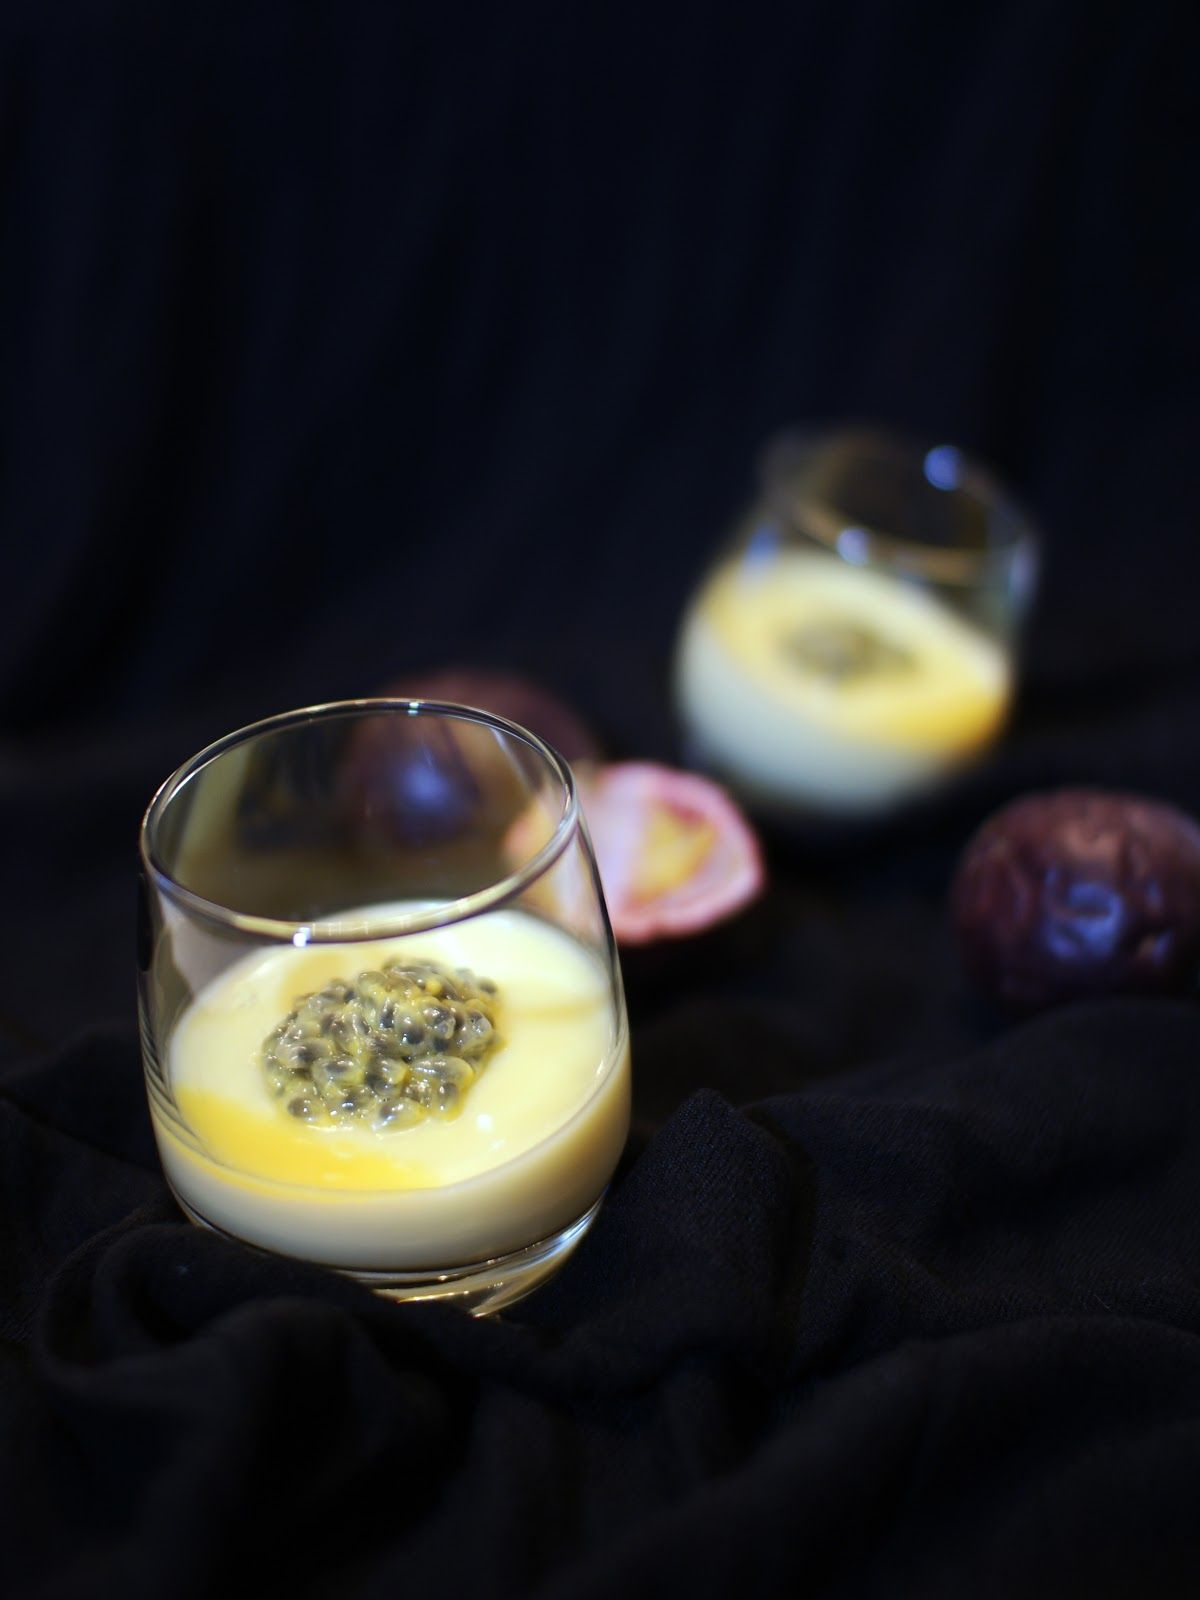 Keittotaiteilua: Passionhedelmäposset #passionhedelmä